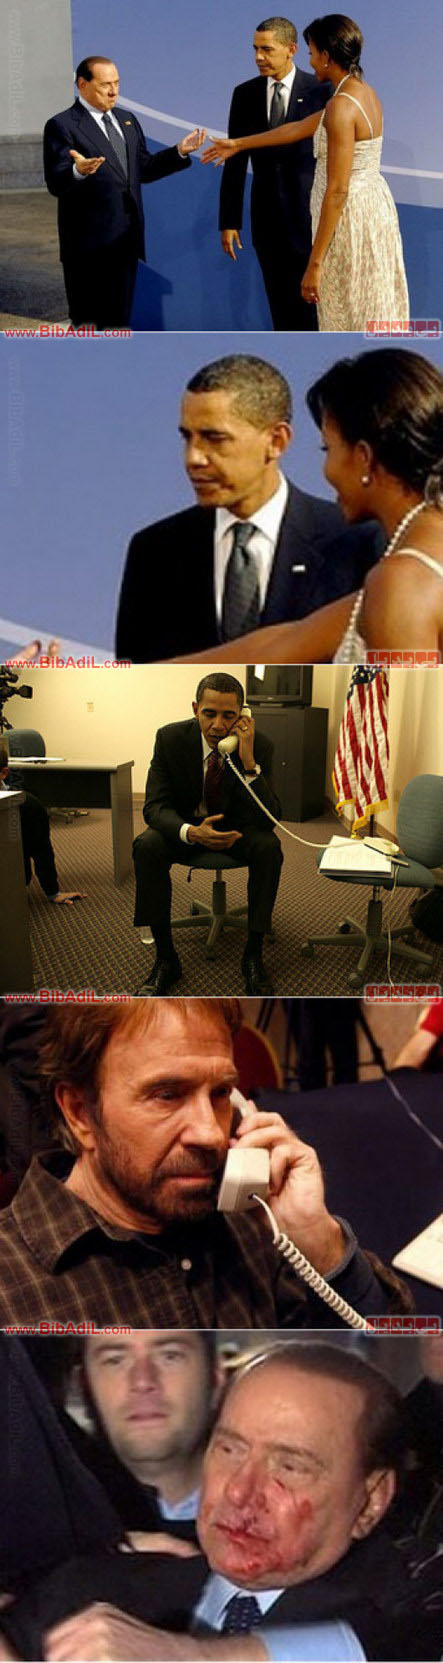 obama_berlusconi.jpg اوباما و برلوسکونی - غیرتی شدن اوباما